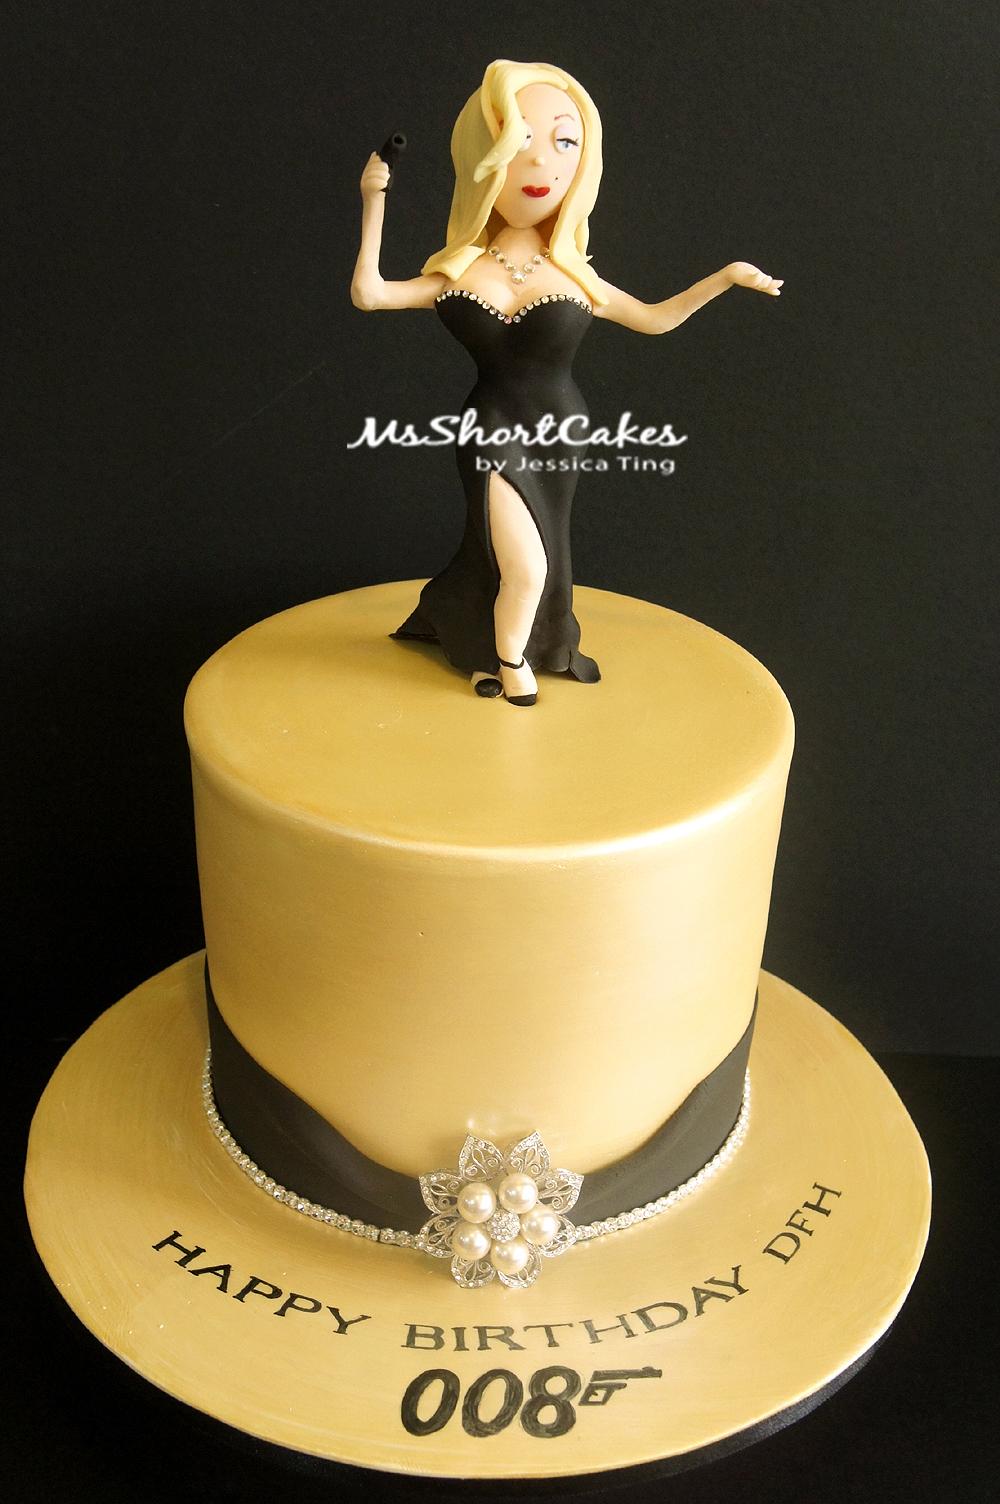 Miss Shortcakes: I love my job!